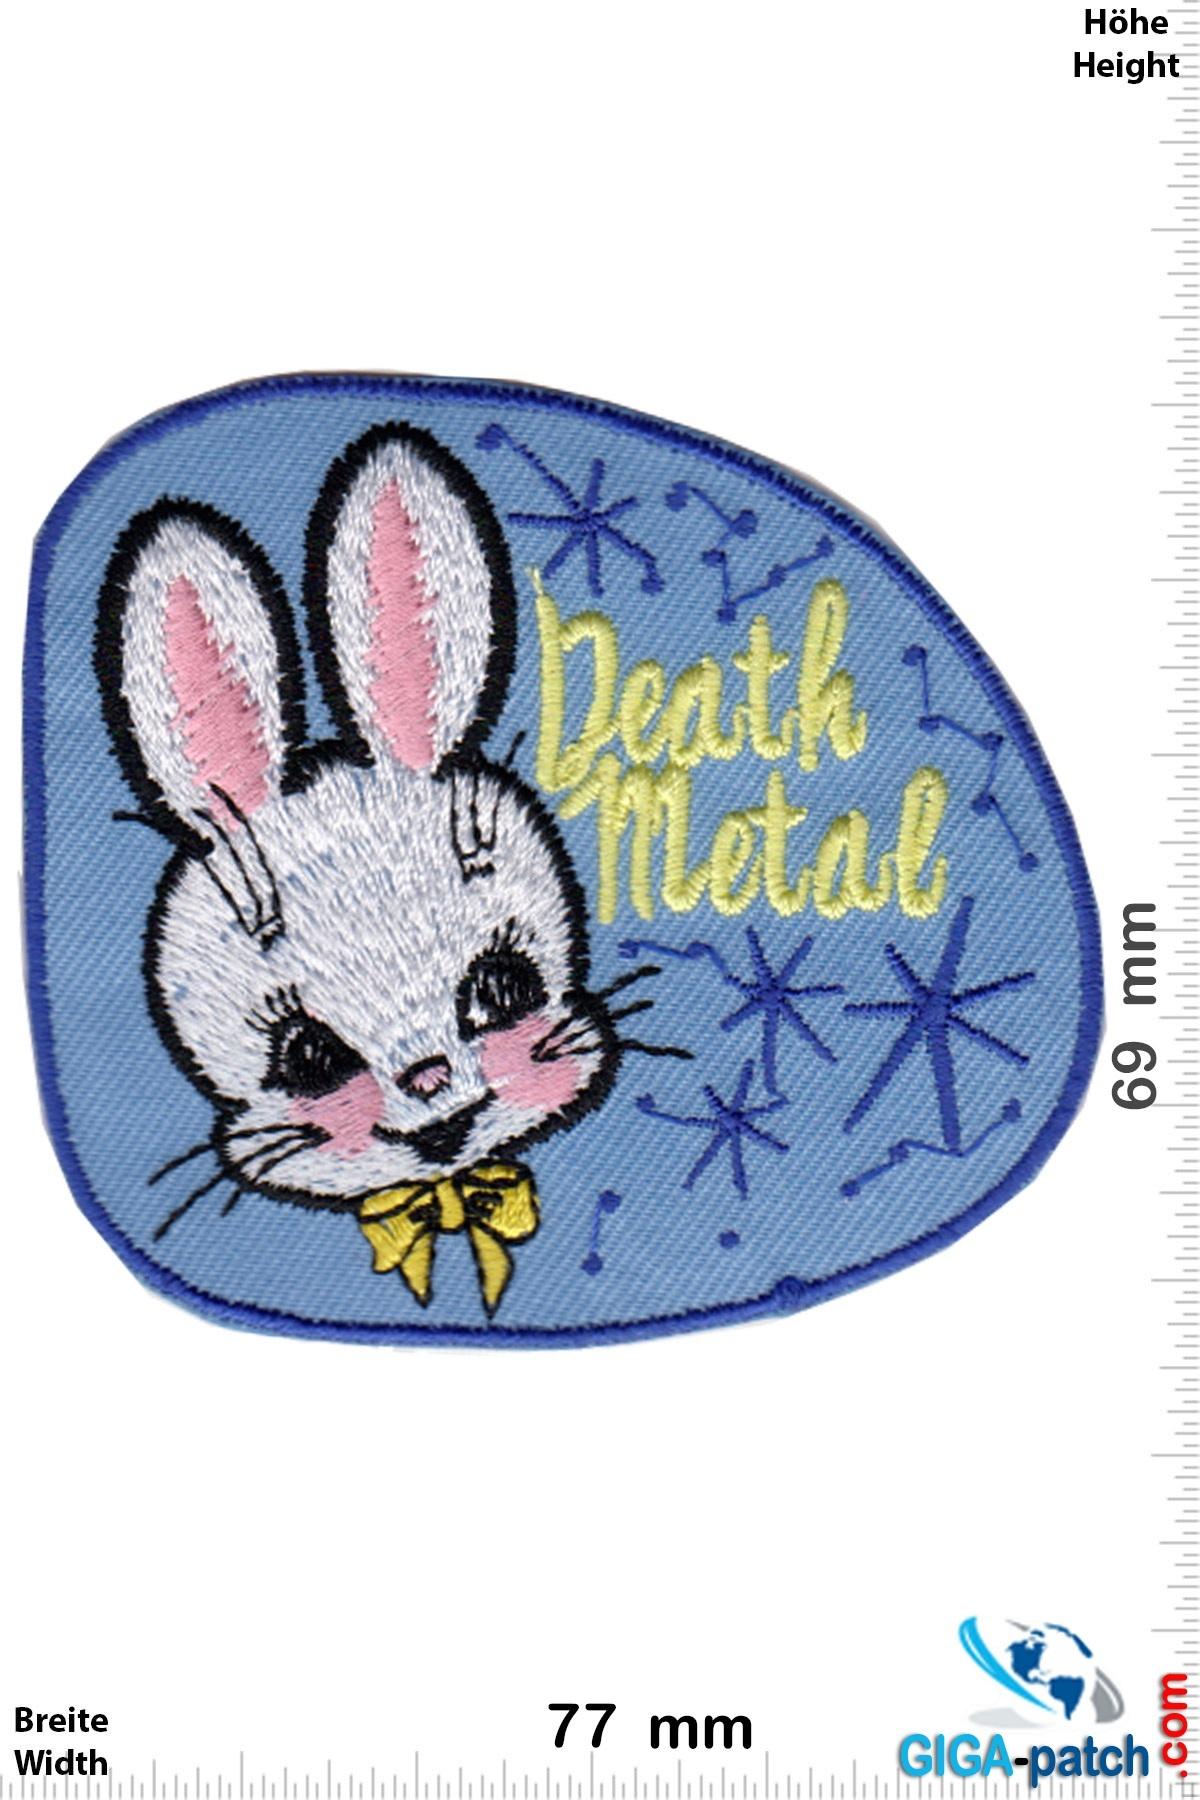 Death Metal - Rabbit